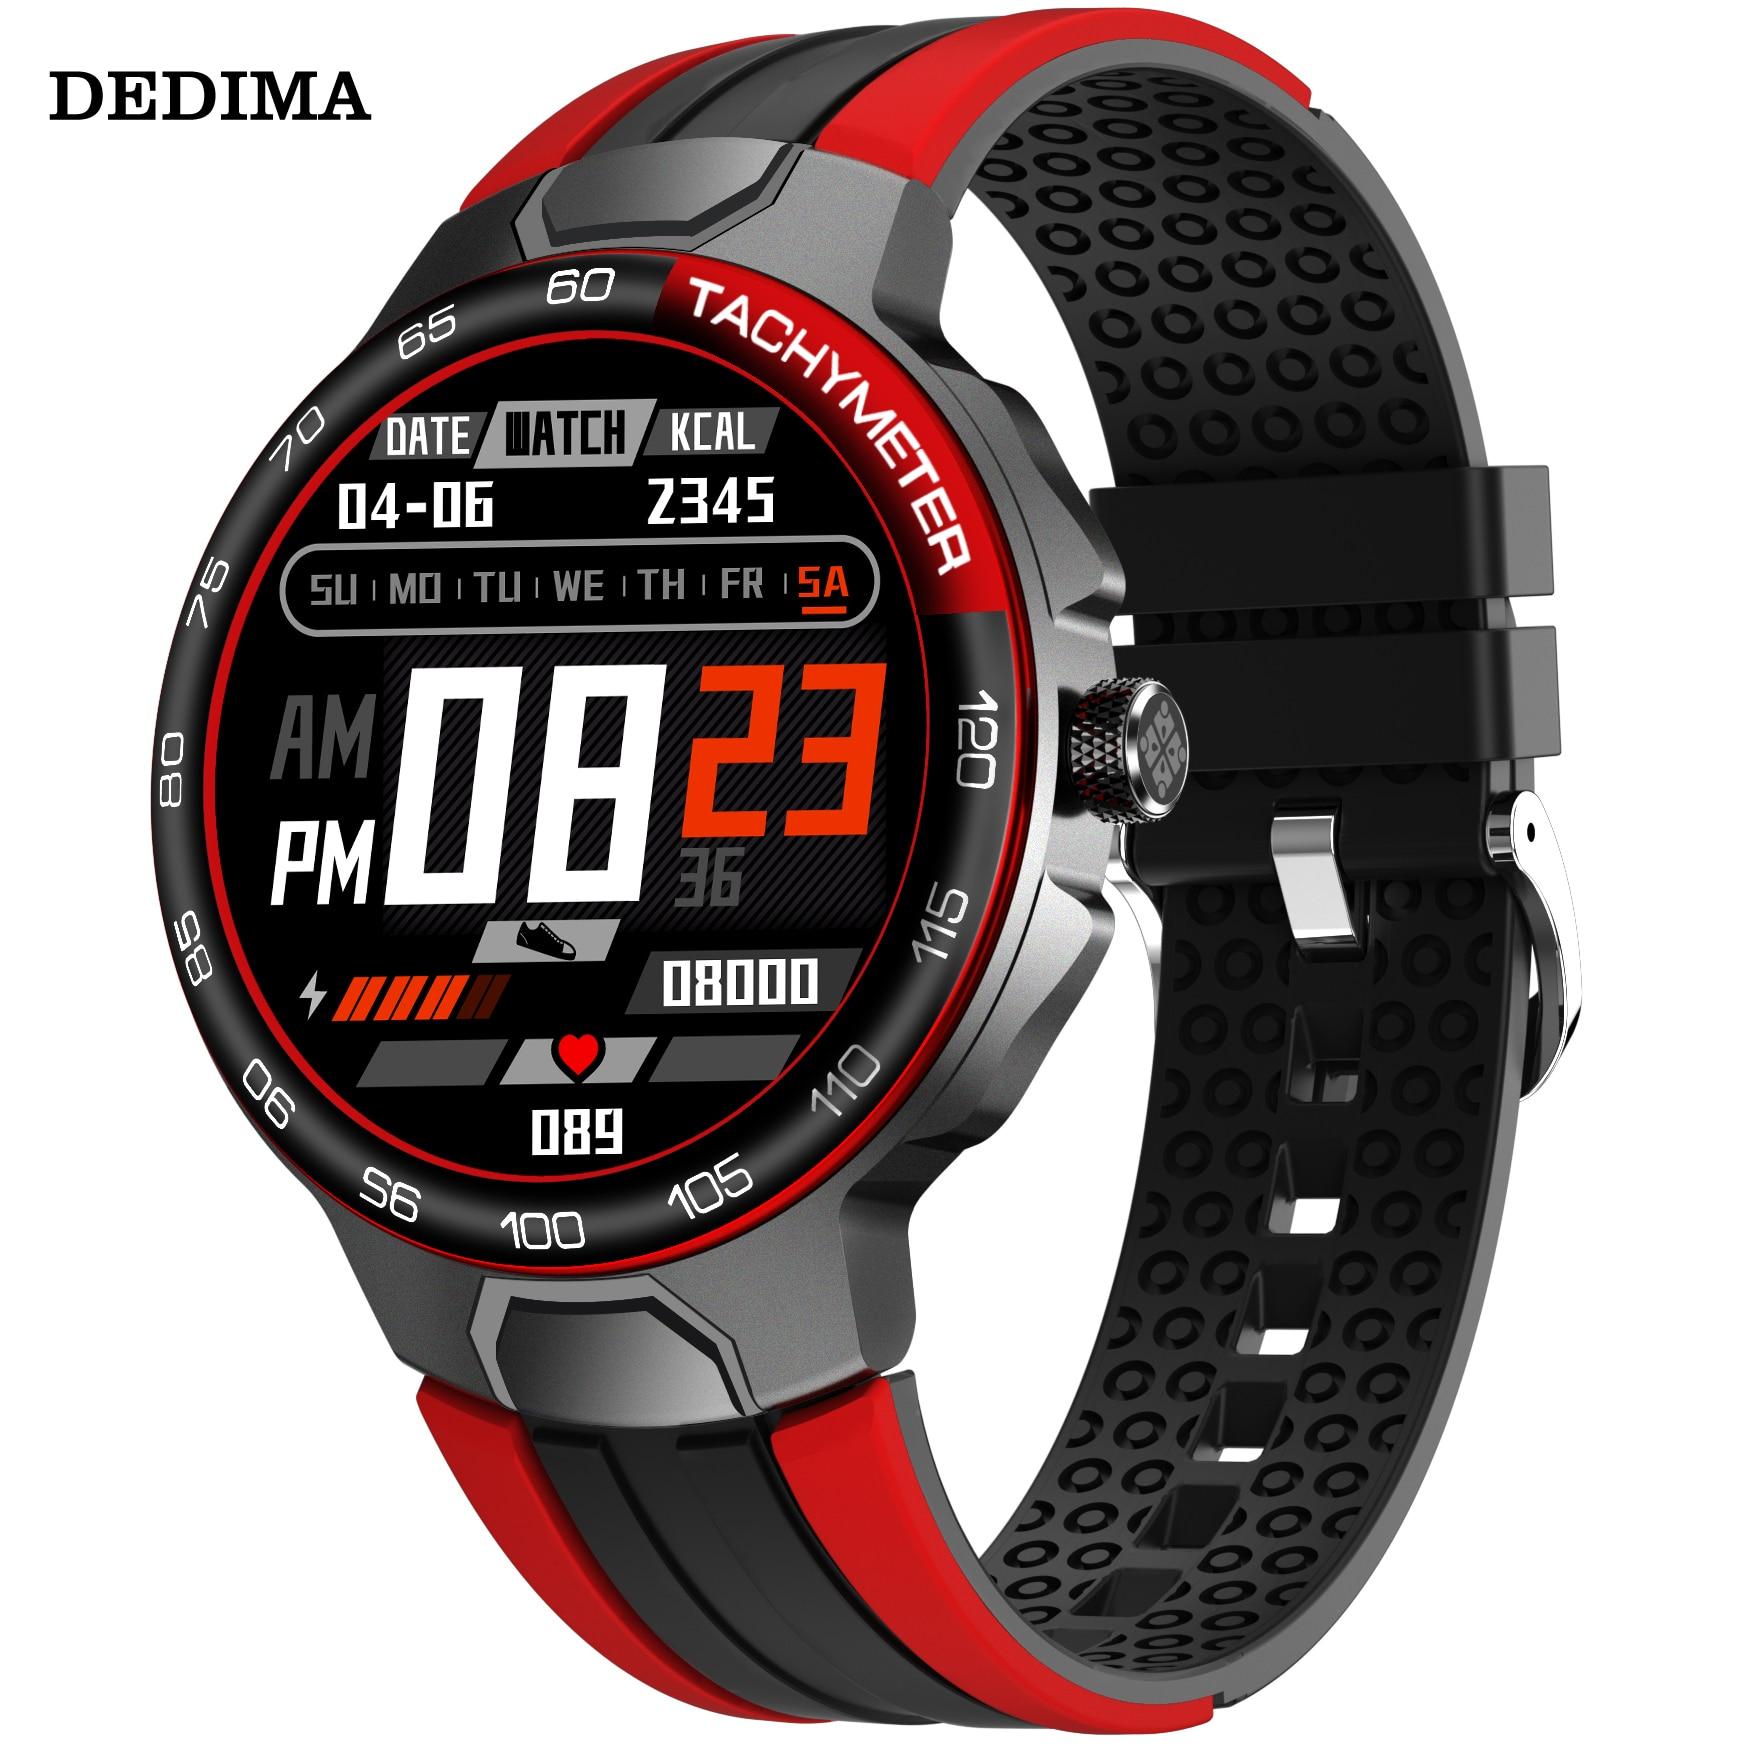 DEDIMA 2021 جديد مكالمات بلوتوث ساعة ذكية الرجال النساء مقاوم للماء Smartwatch مشغل MP3 ل ممن لهم أندرويد أبل شاومي هواوي